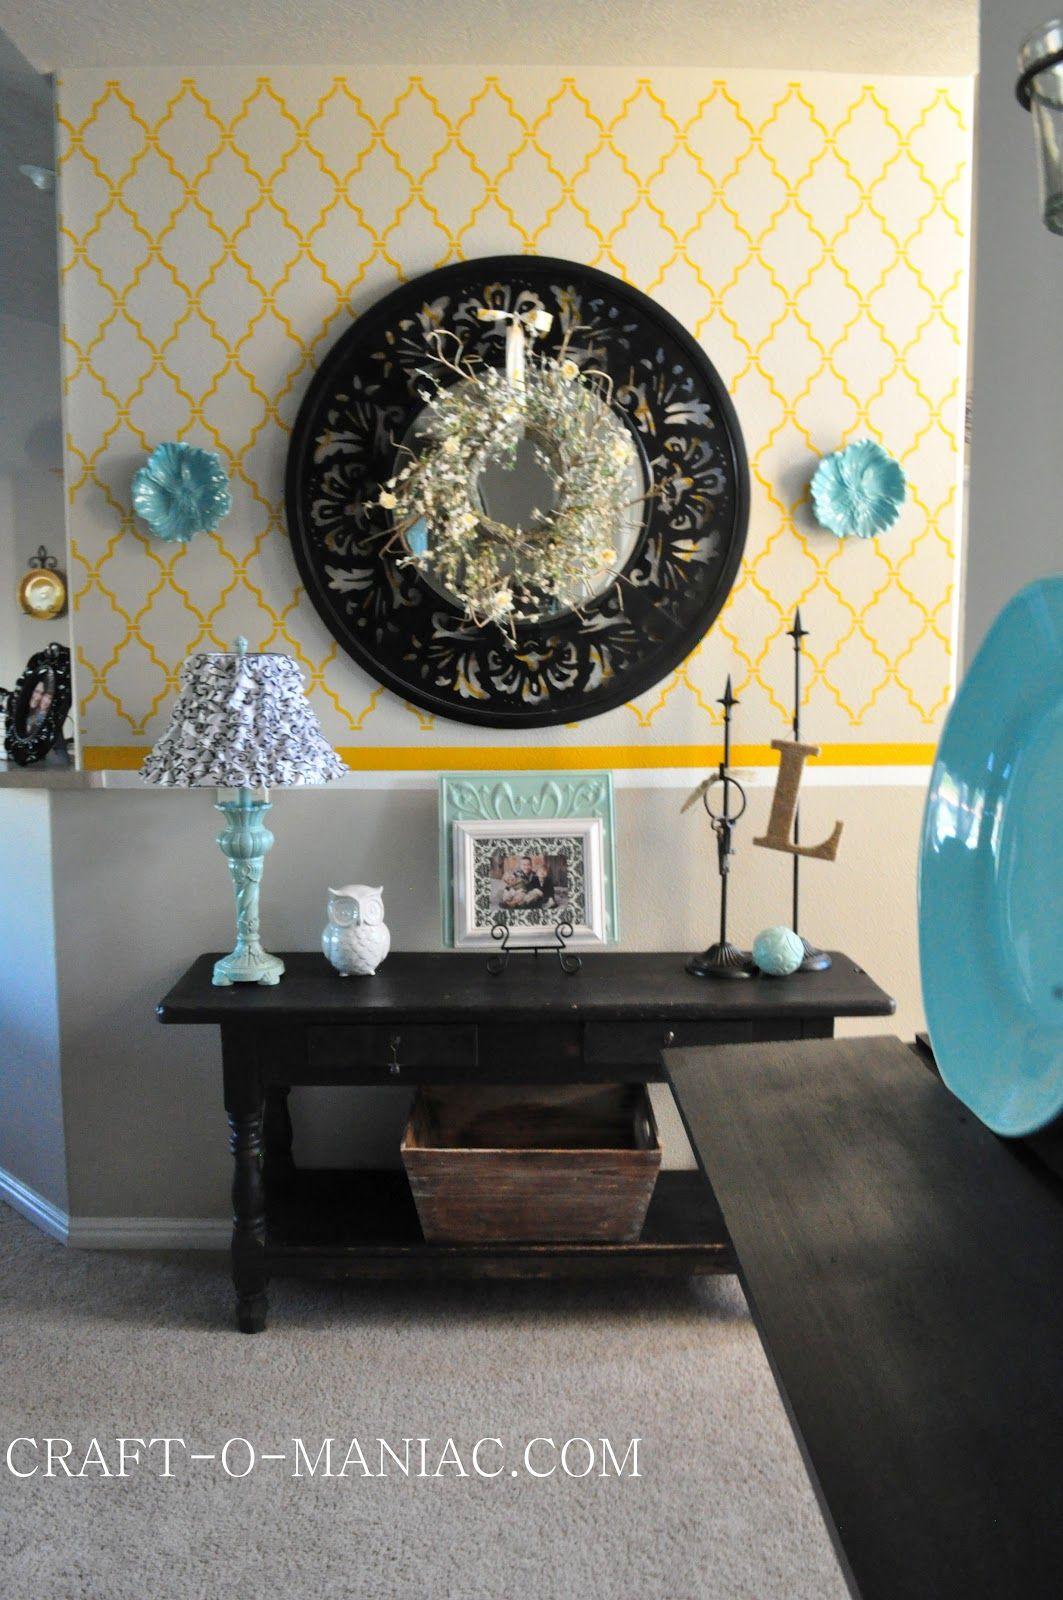 Home Decor New Entry Table From Craigslist Home Decor Home Decor